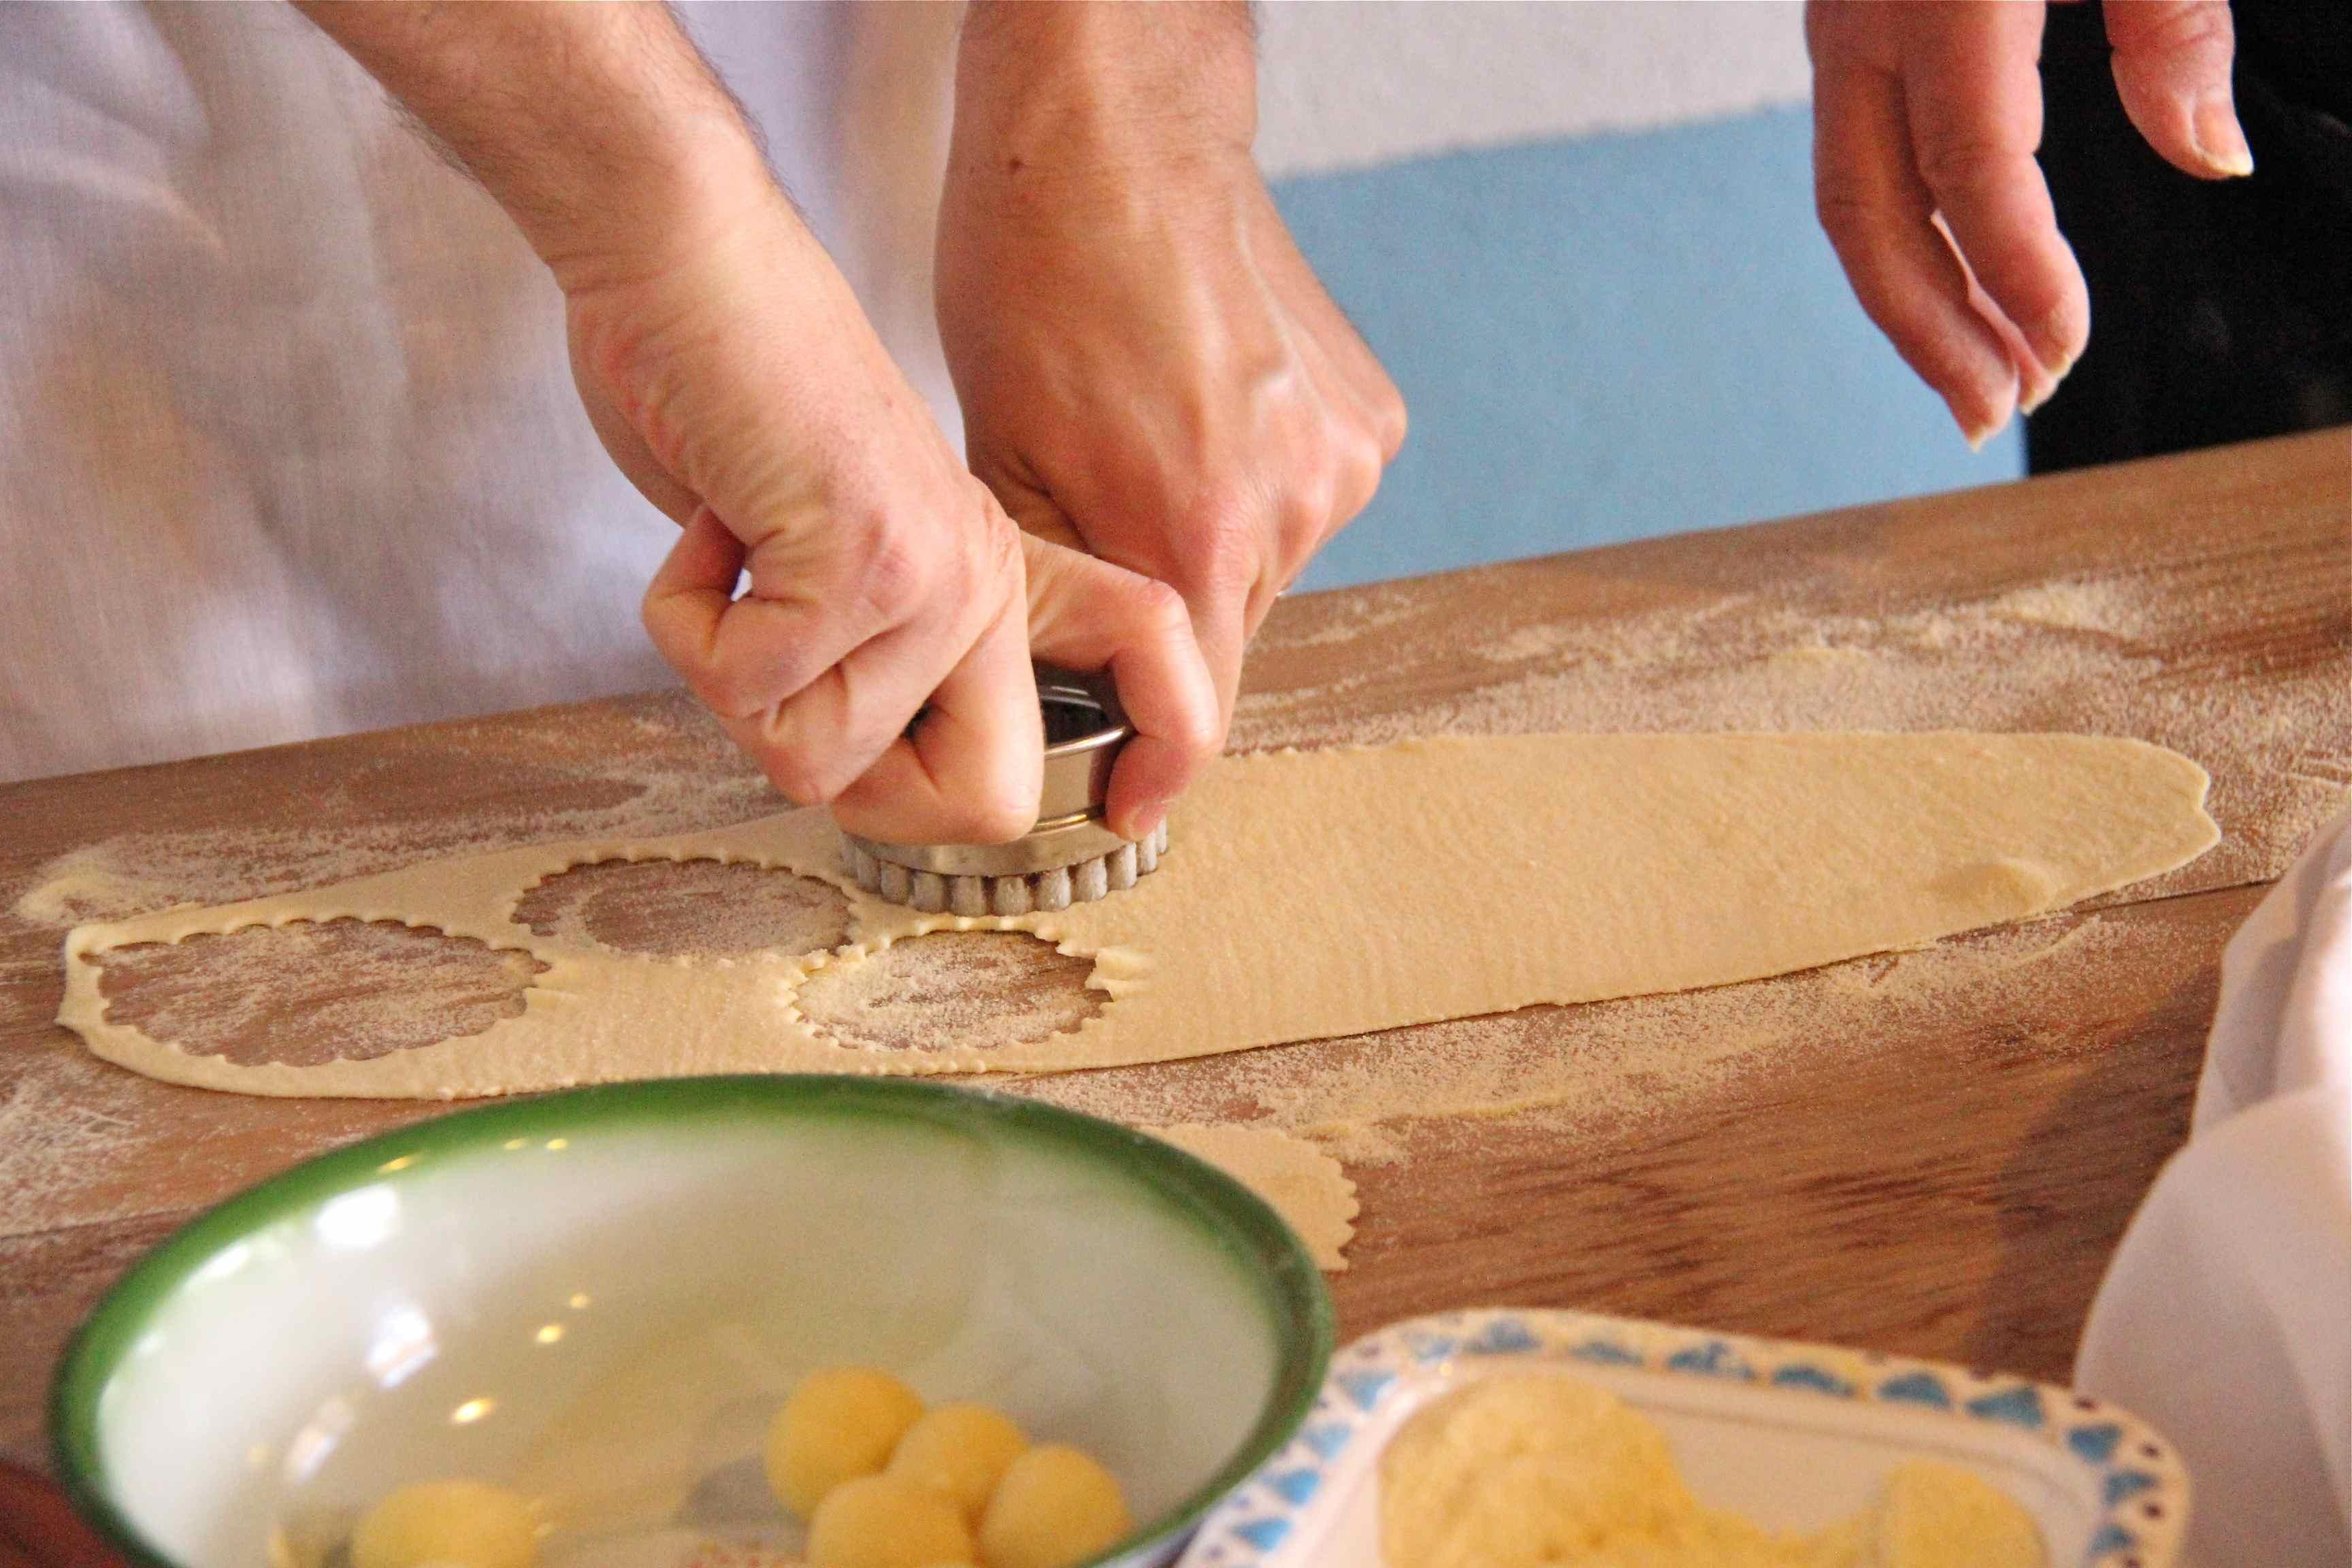 Découpe de la pâte à ravioli